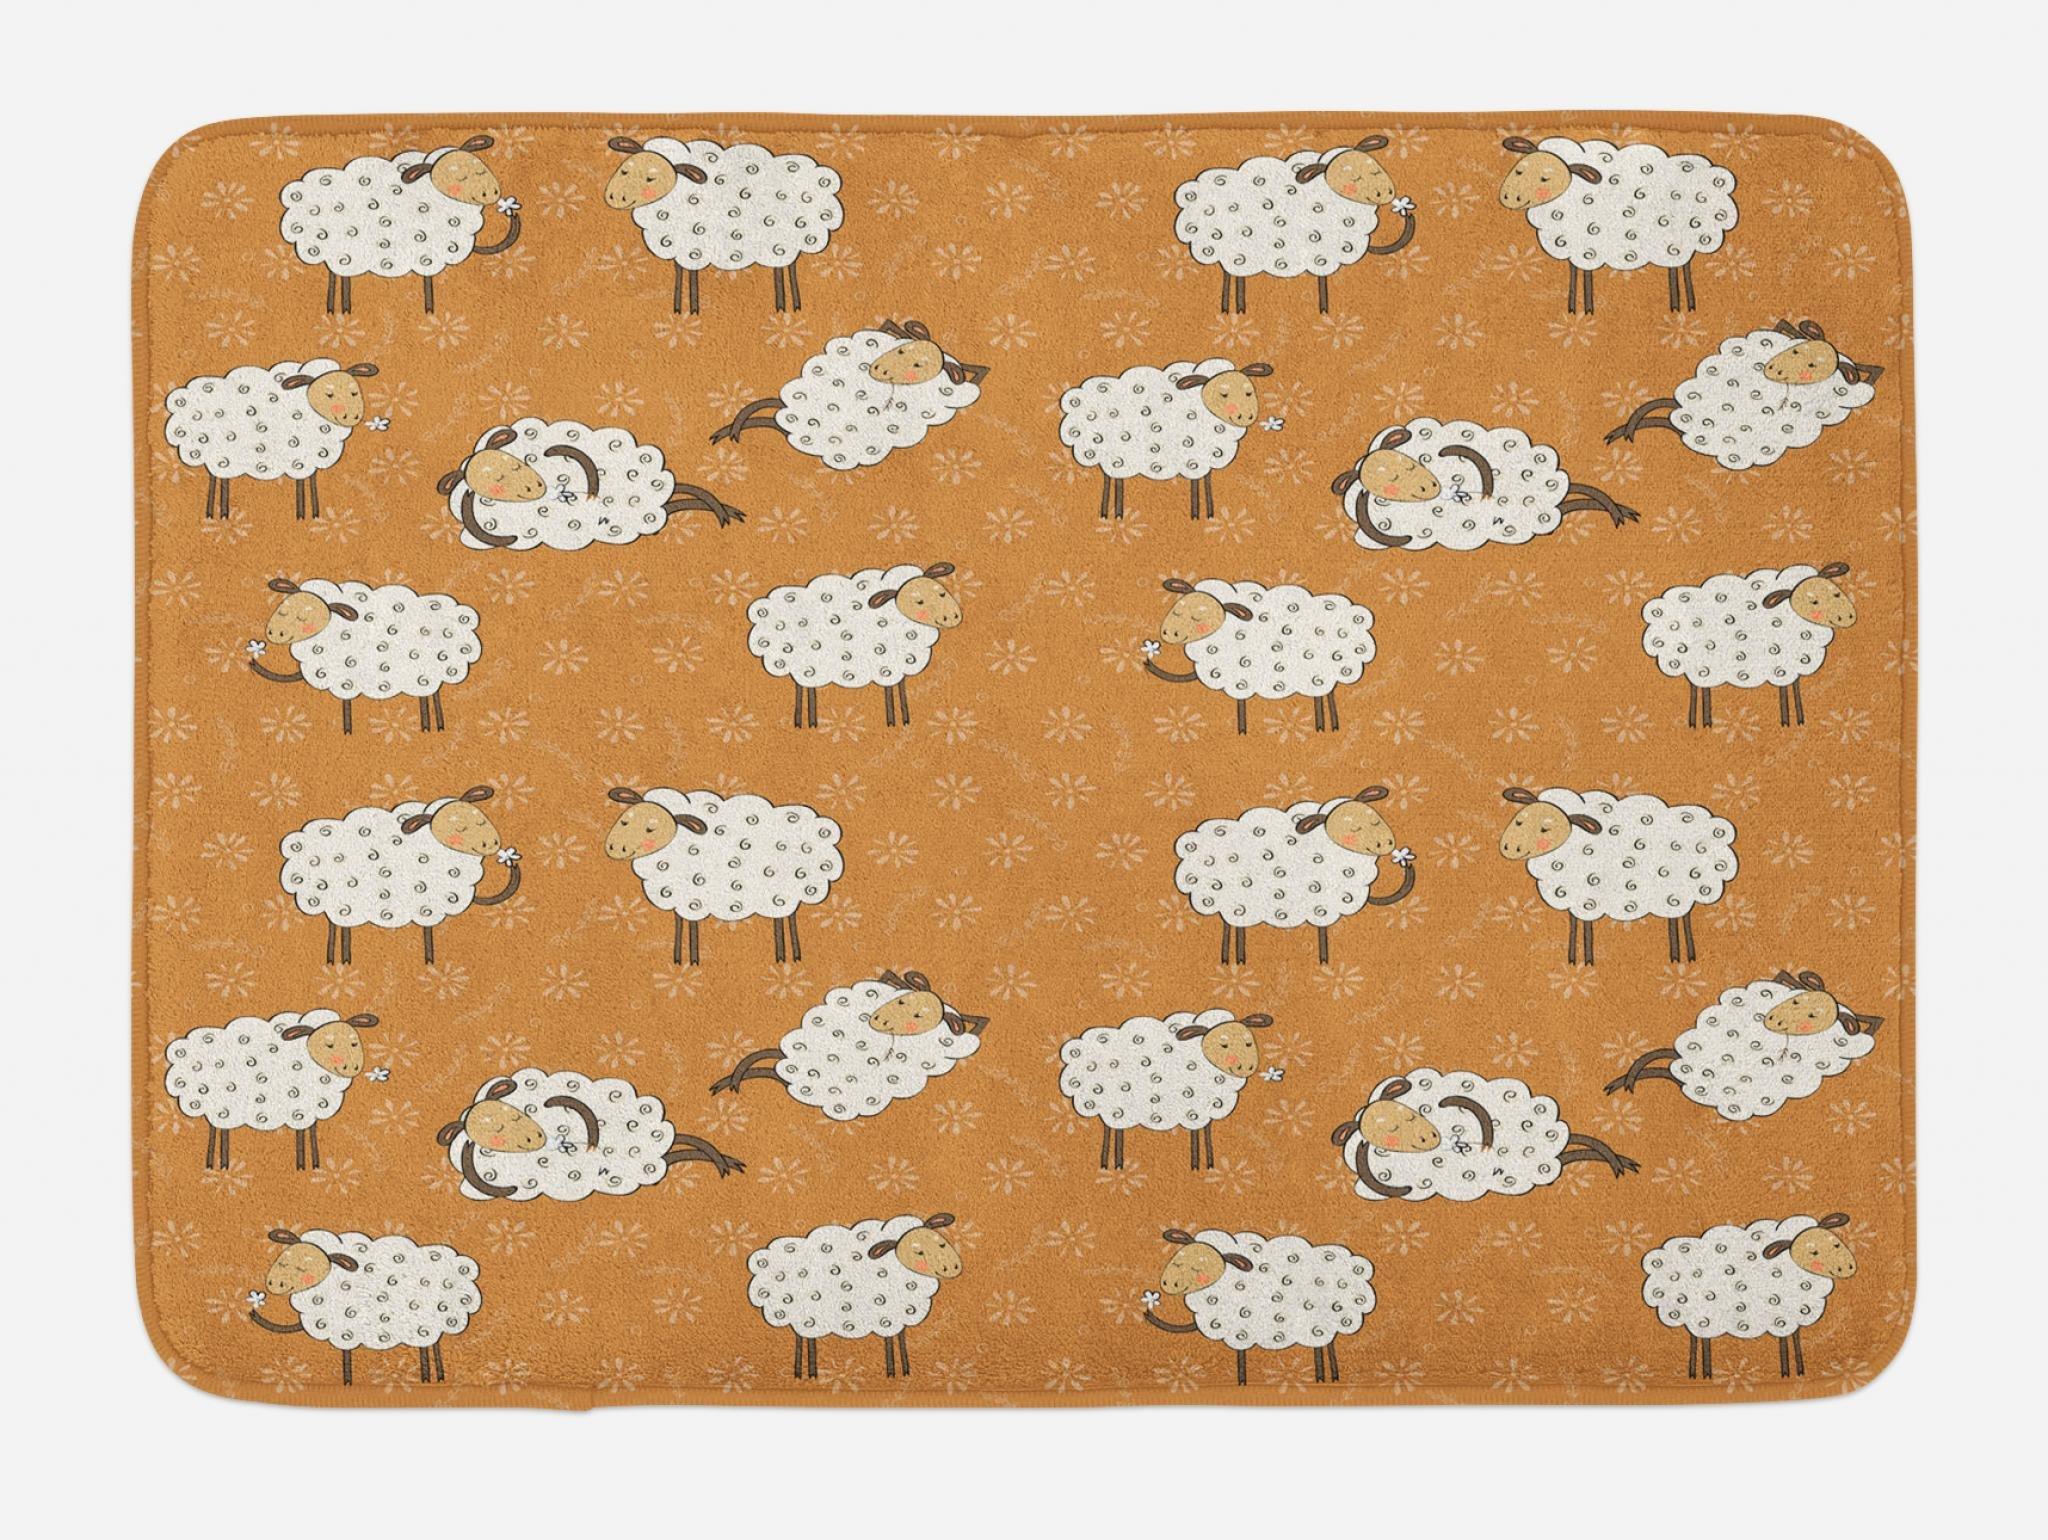 Lunarable Sheep Bath Mat, Farmland Cartoon Design Nursery Animal Lover Theme on Amber Flowers Background, Plush Bathroom Decor Mat with Non Slip Backing, 29.5 W X 17.5 W Inches, Amber Off White by Lunarable (Image #1)